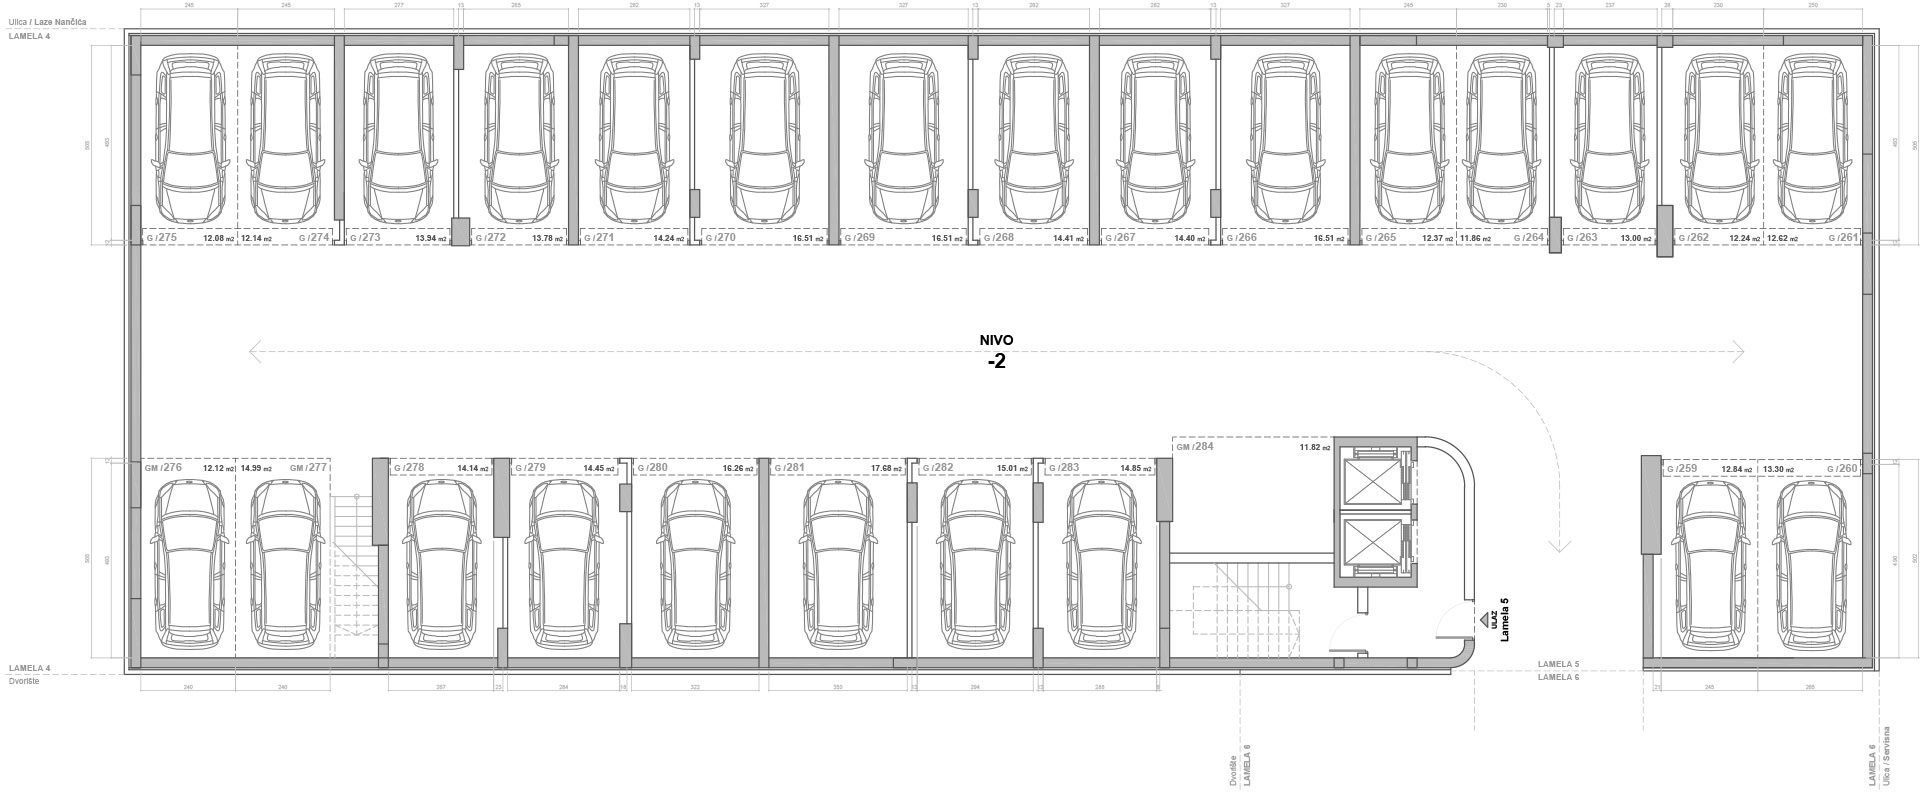 Blok D Lamela 5 Garaža Nivo -2